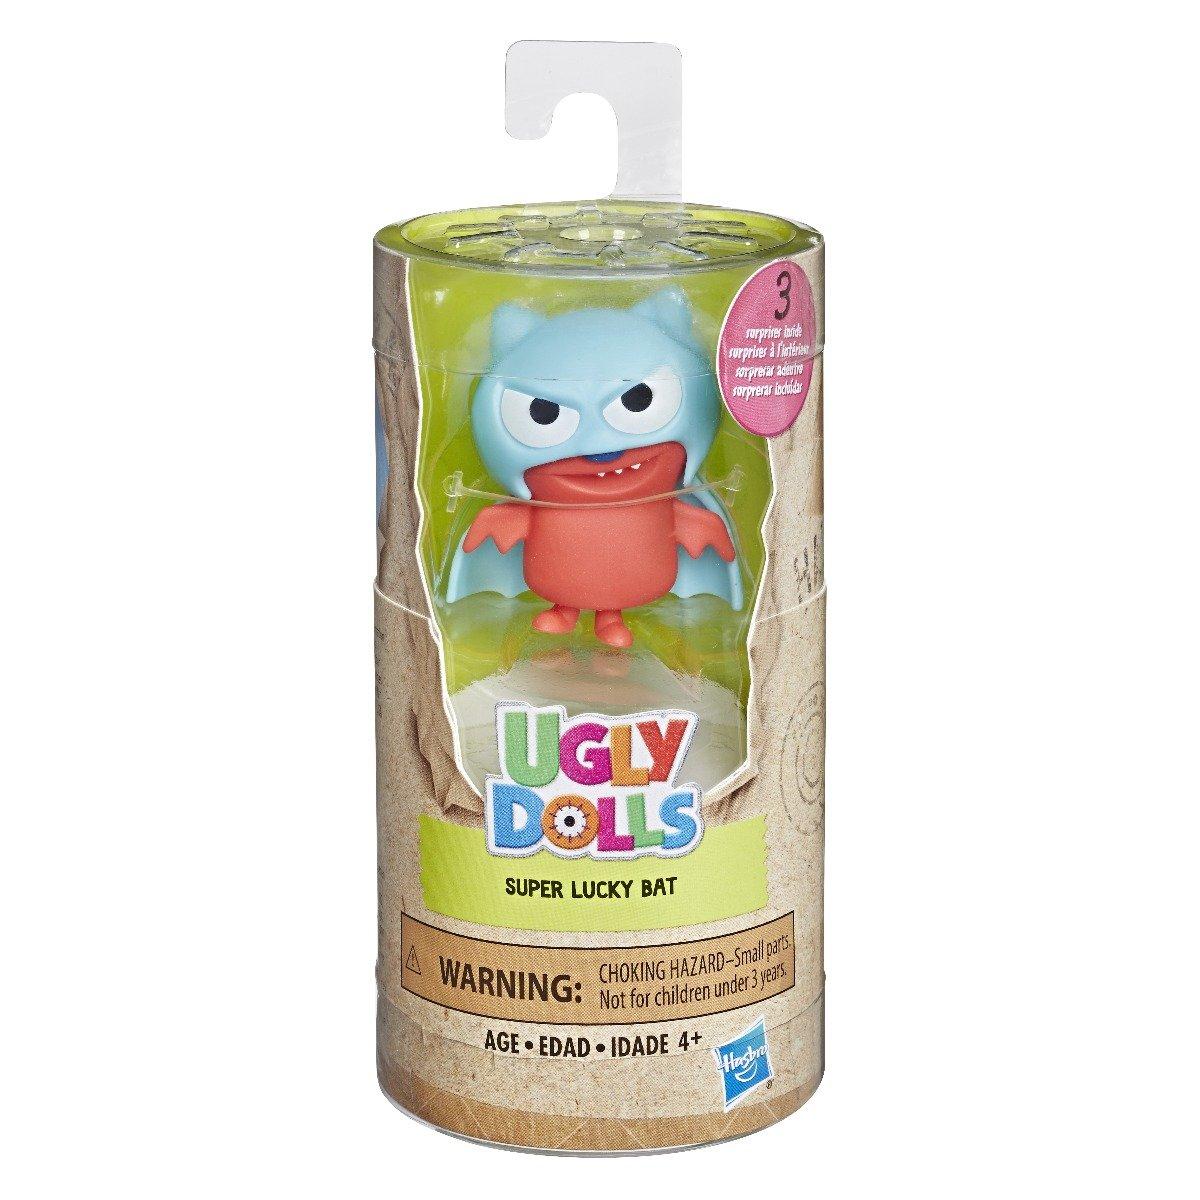 Figurina cu accesorii Ugly Dolls, Super Lucky Bat (E4543) imagine